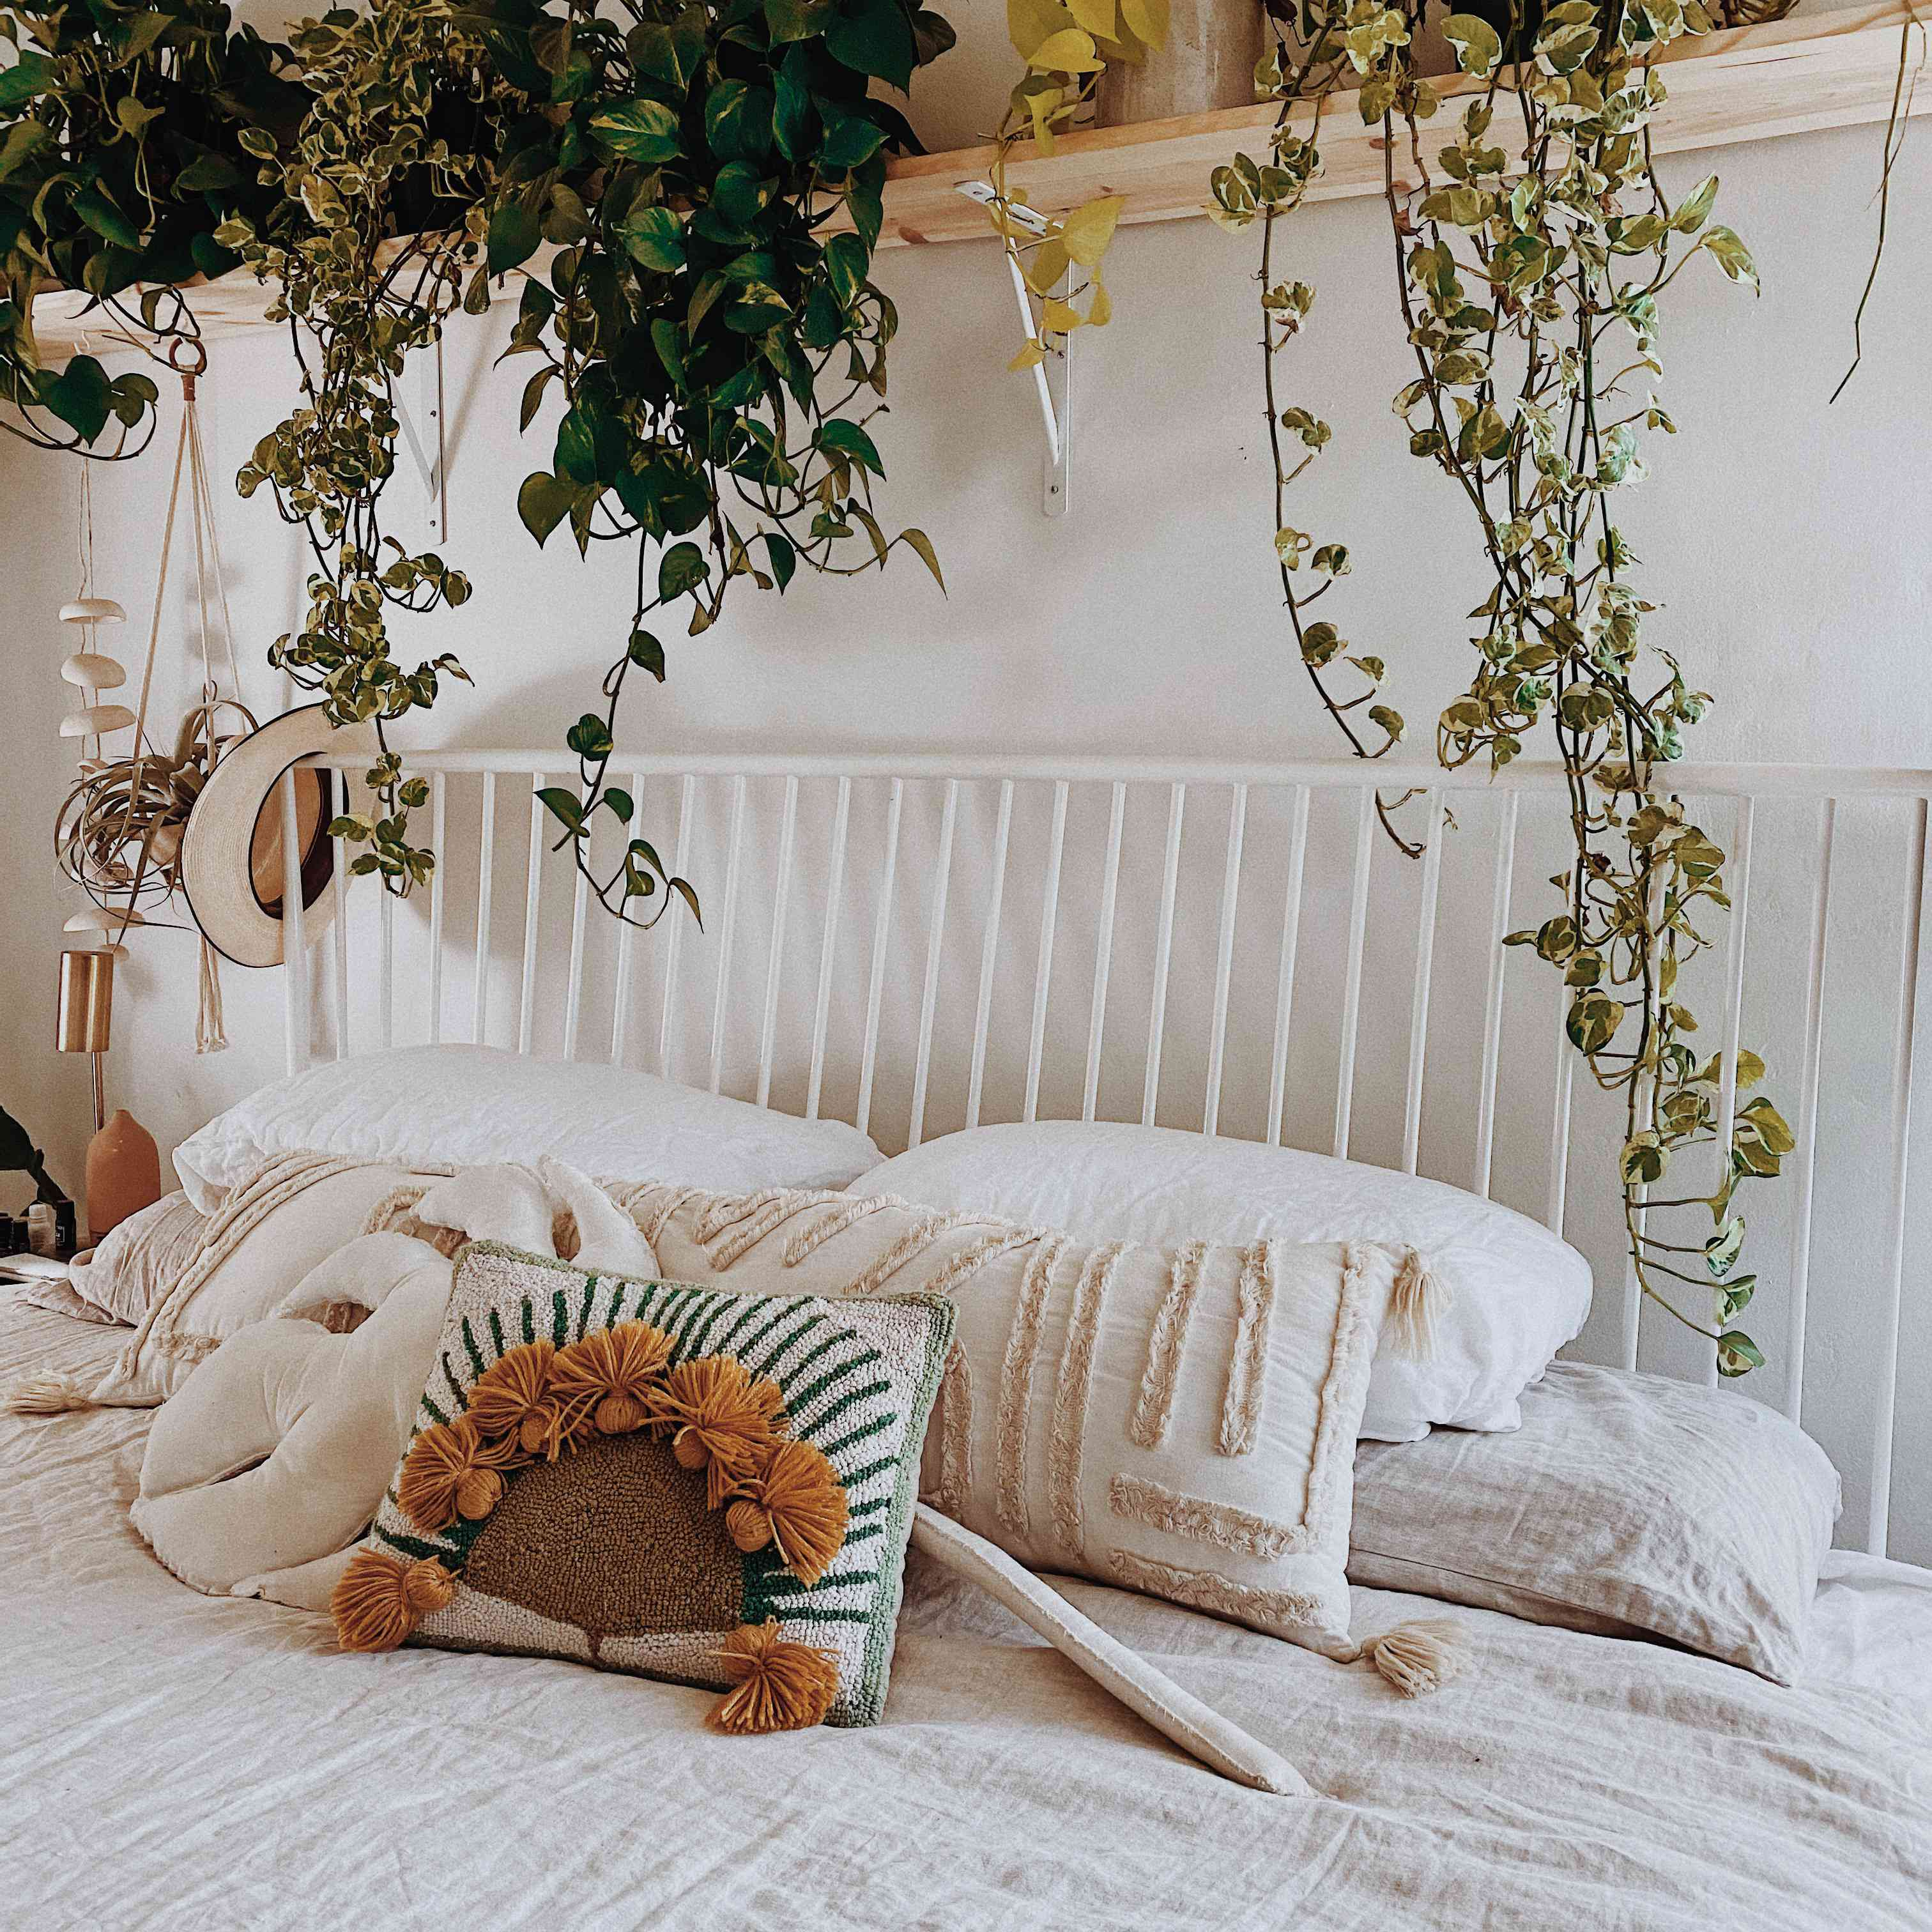 hanging plants in a bedroom